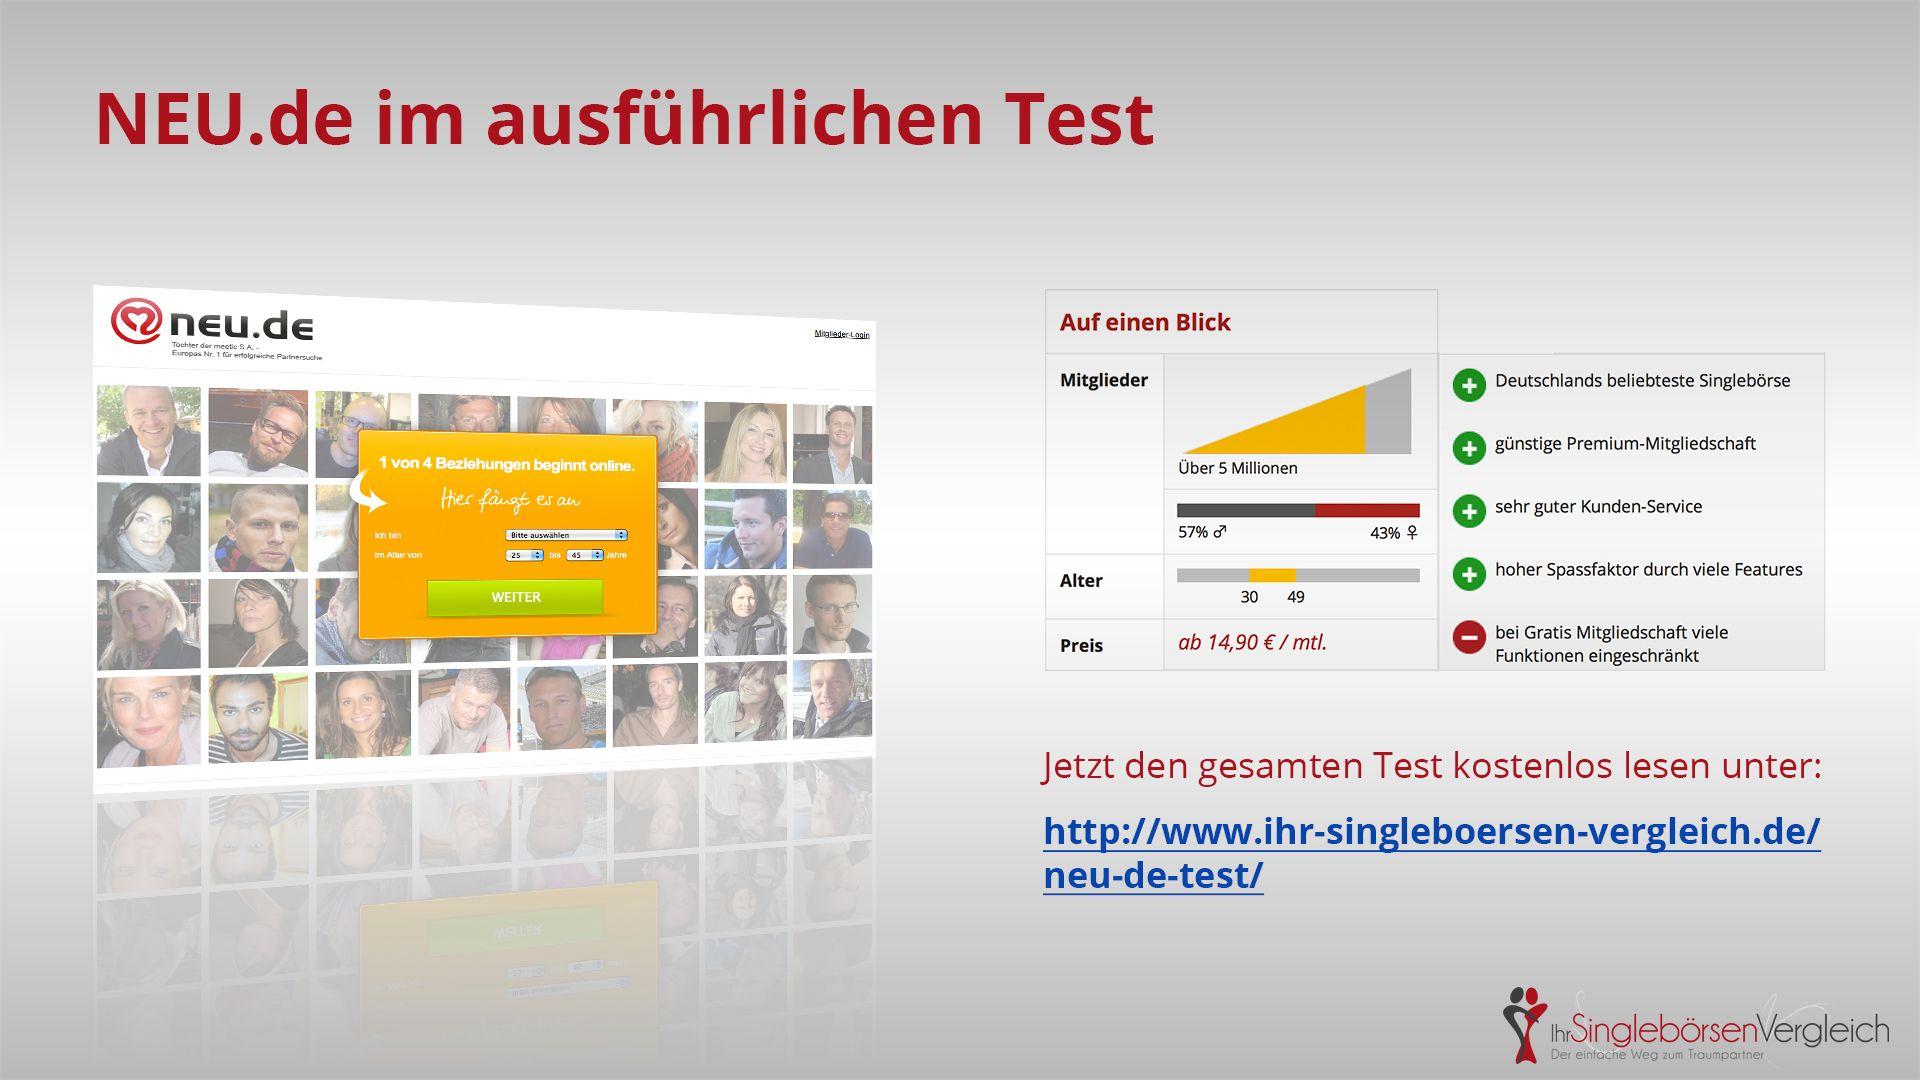 http://www.ihr-singleboersen-vergleich.de/neu-de-test/ - NEU.de im ausführlichen Test